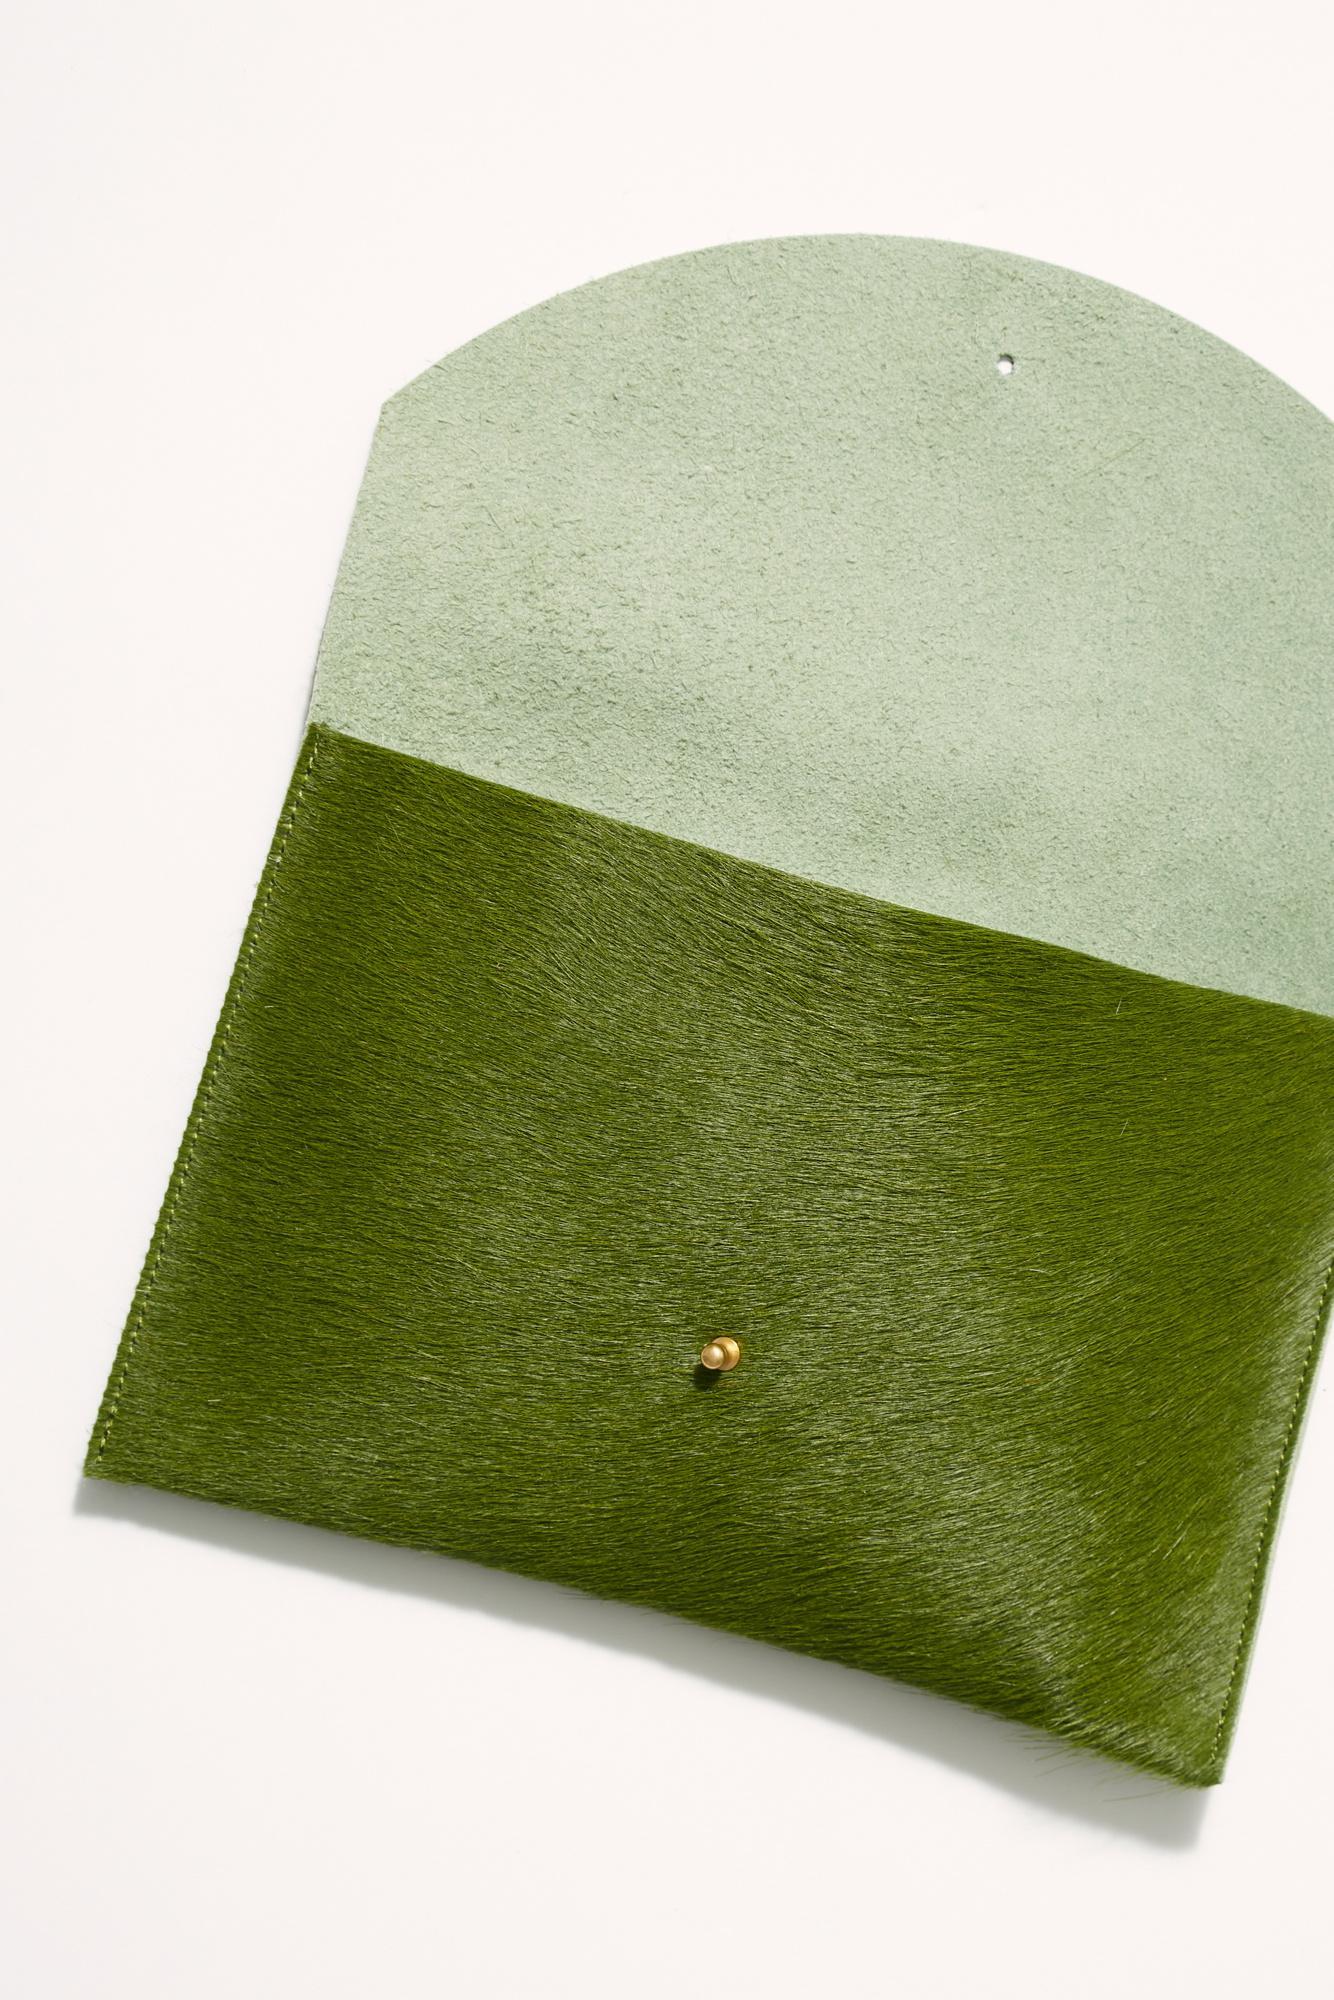 aa74e2ac8 Lyst - Free People Primecut Envelope Clutch in Green